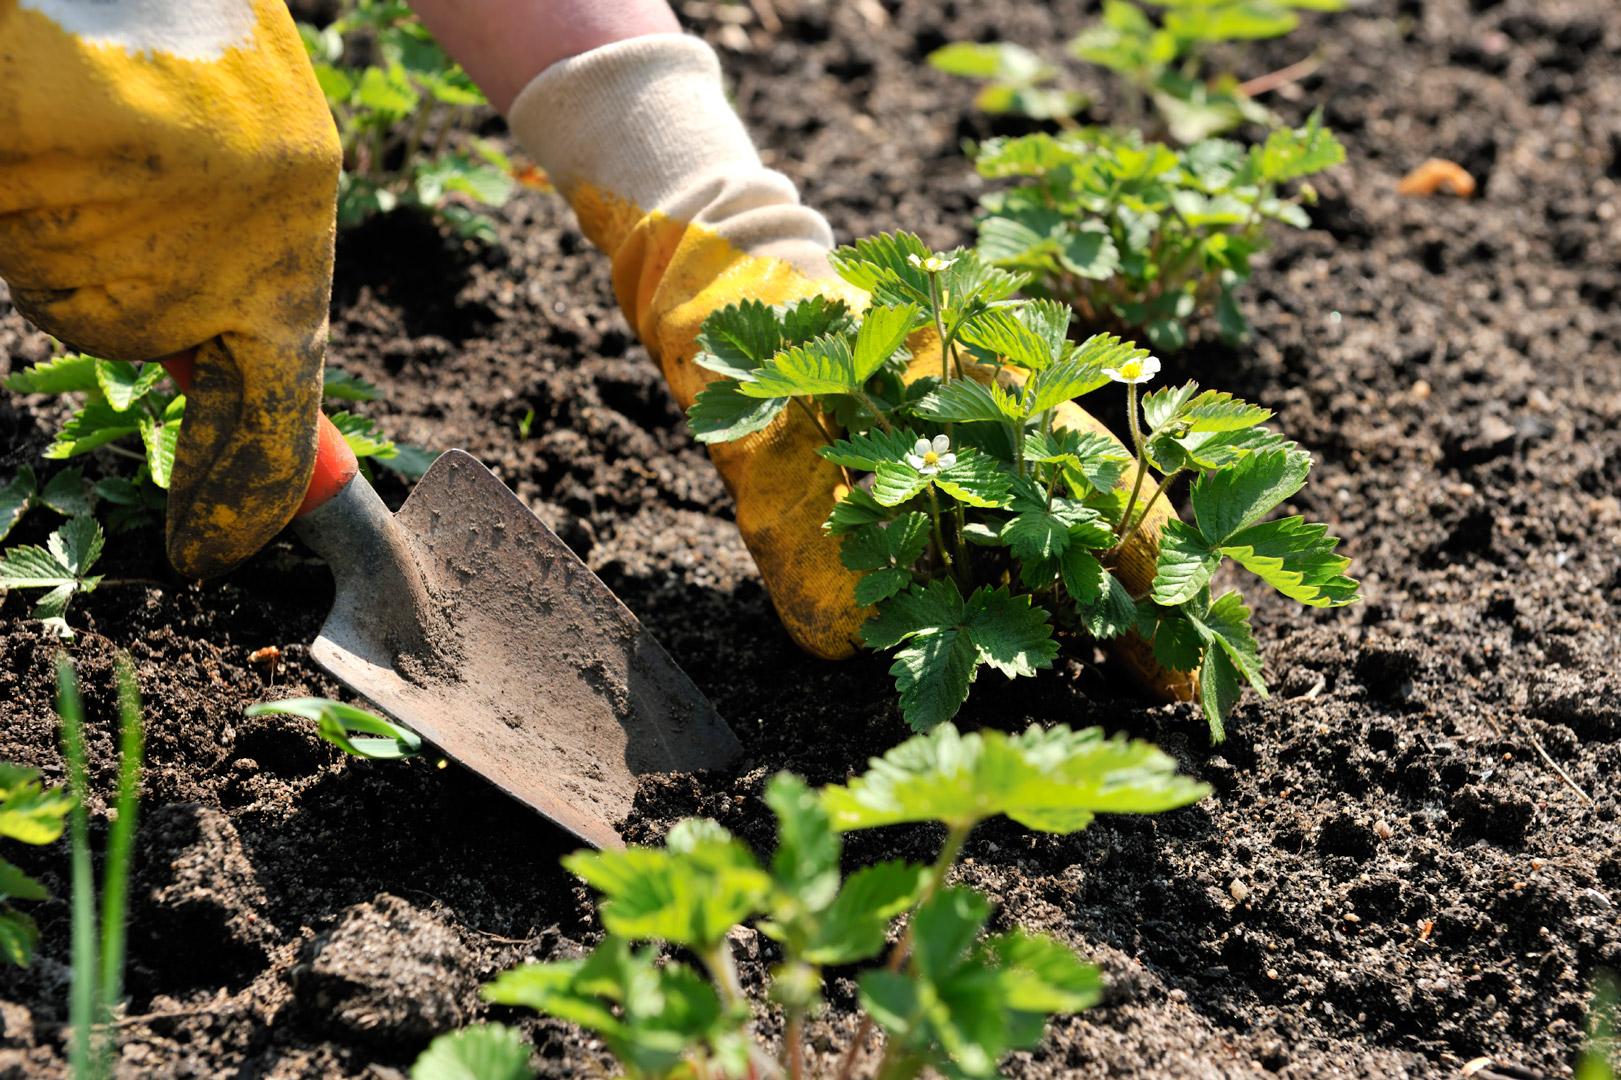 Horticultural equipment